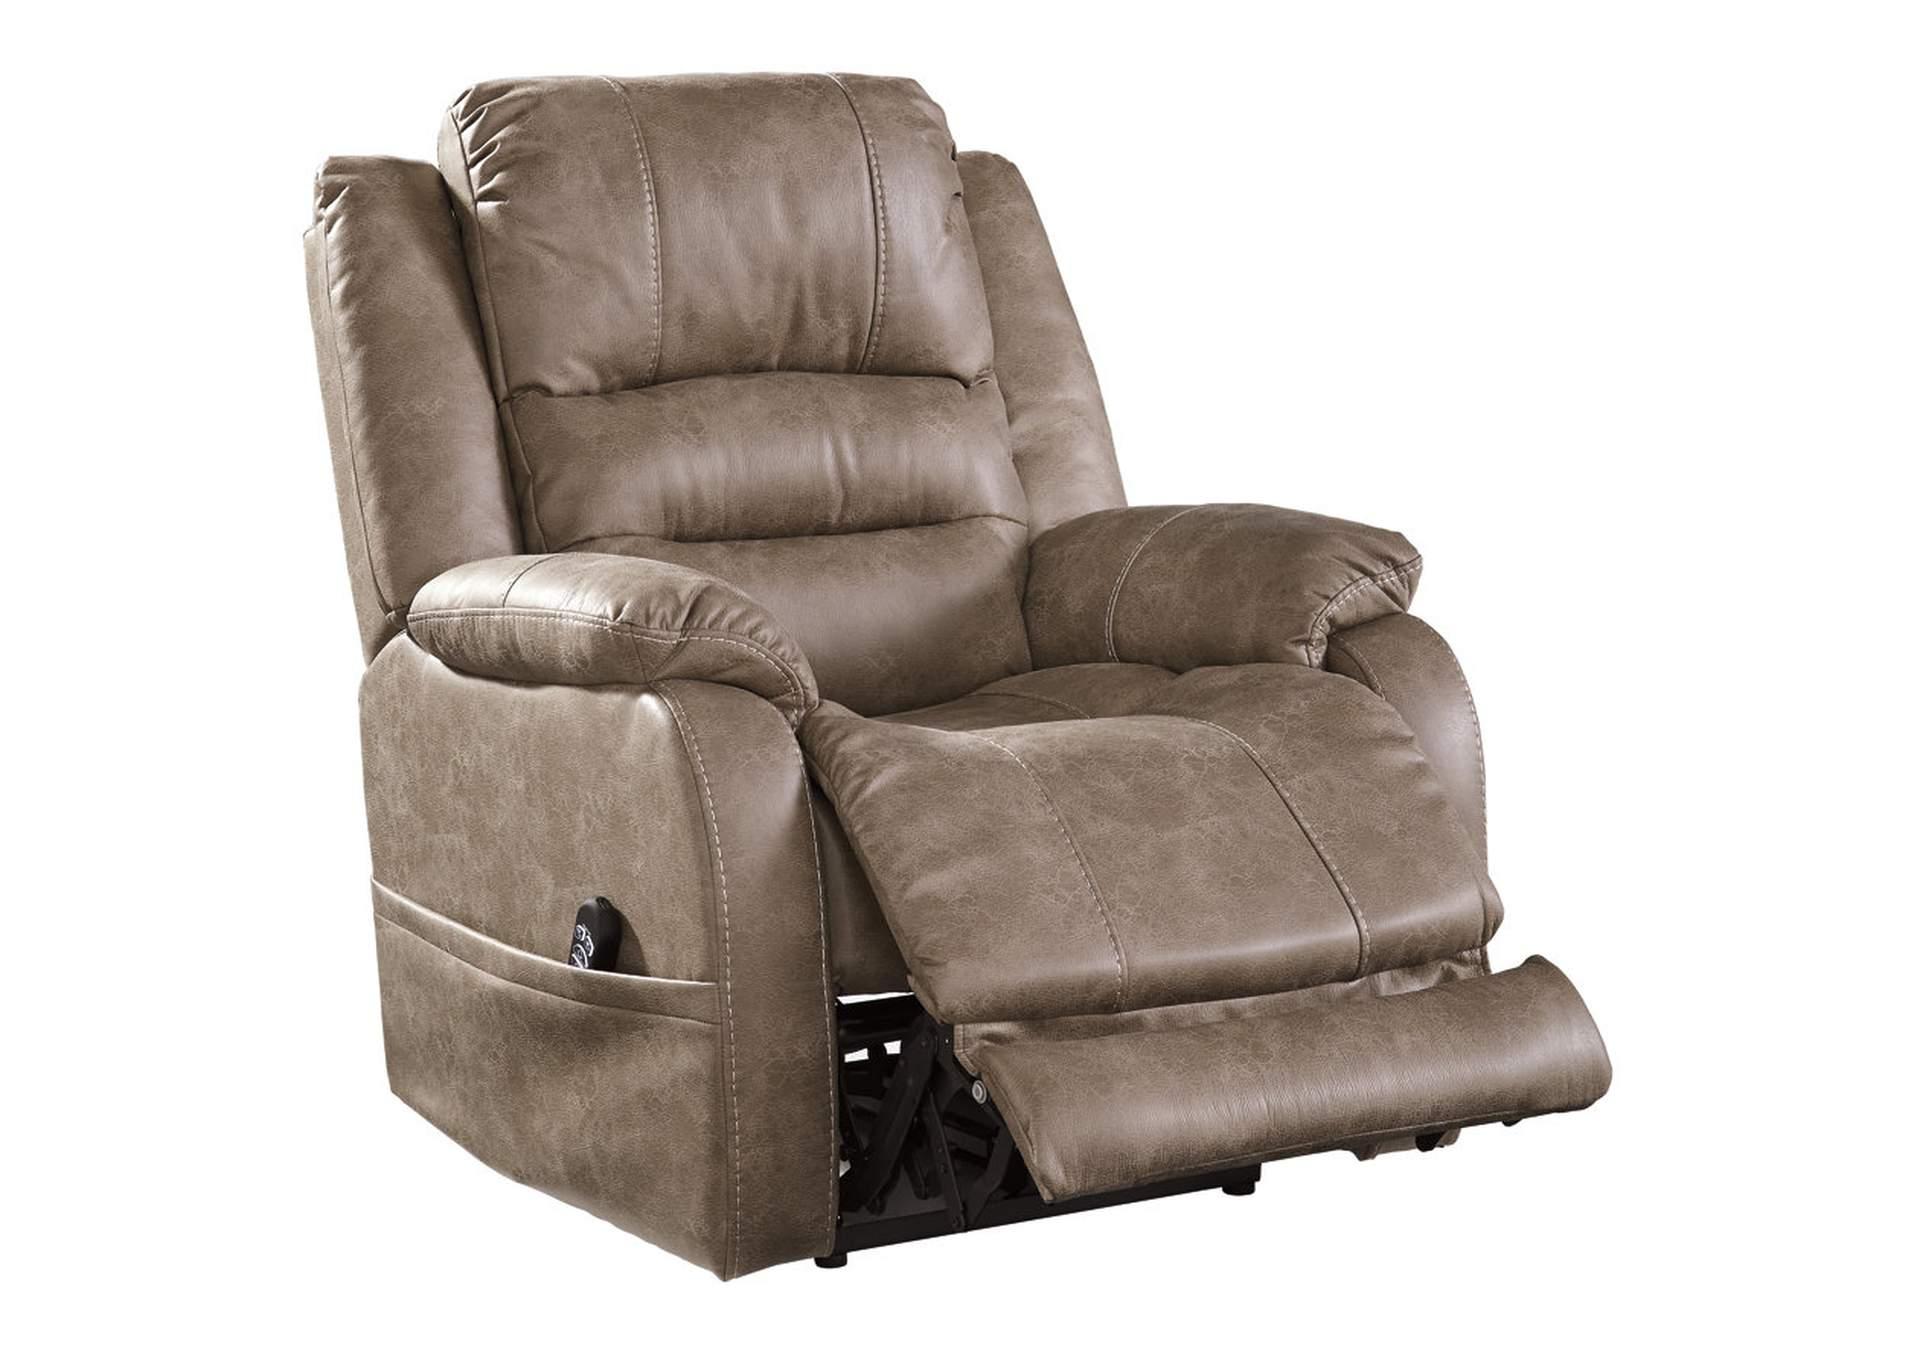 Long Furniture Rainbow City Al Barling Mushroom Power Recliner W Adjustable Headrest